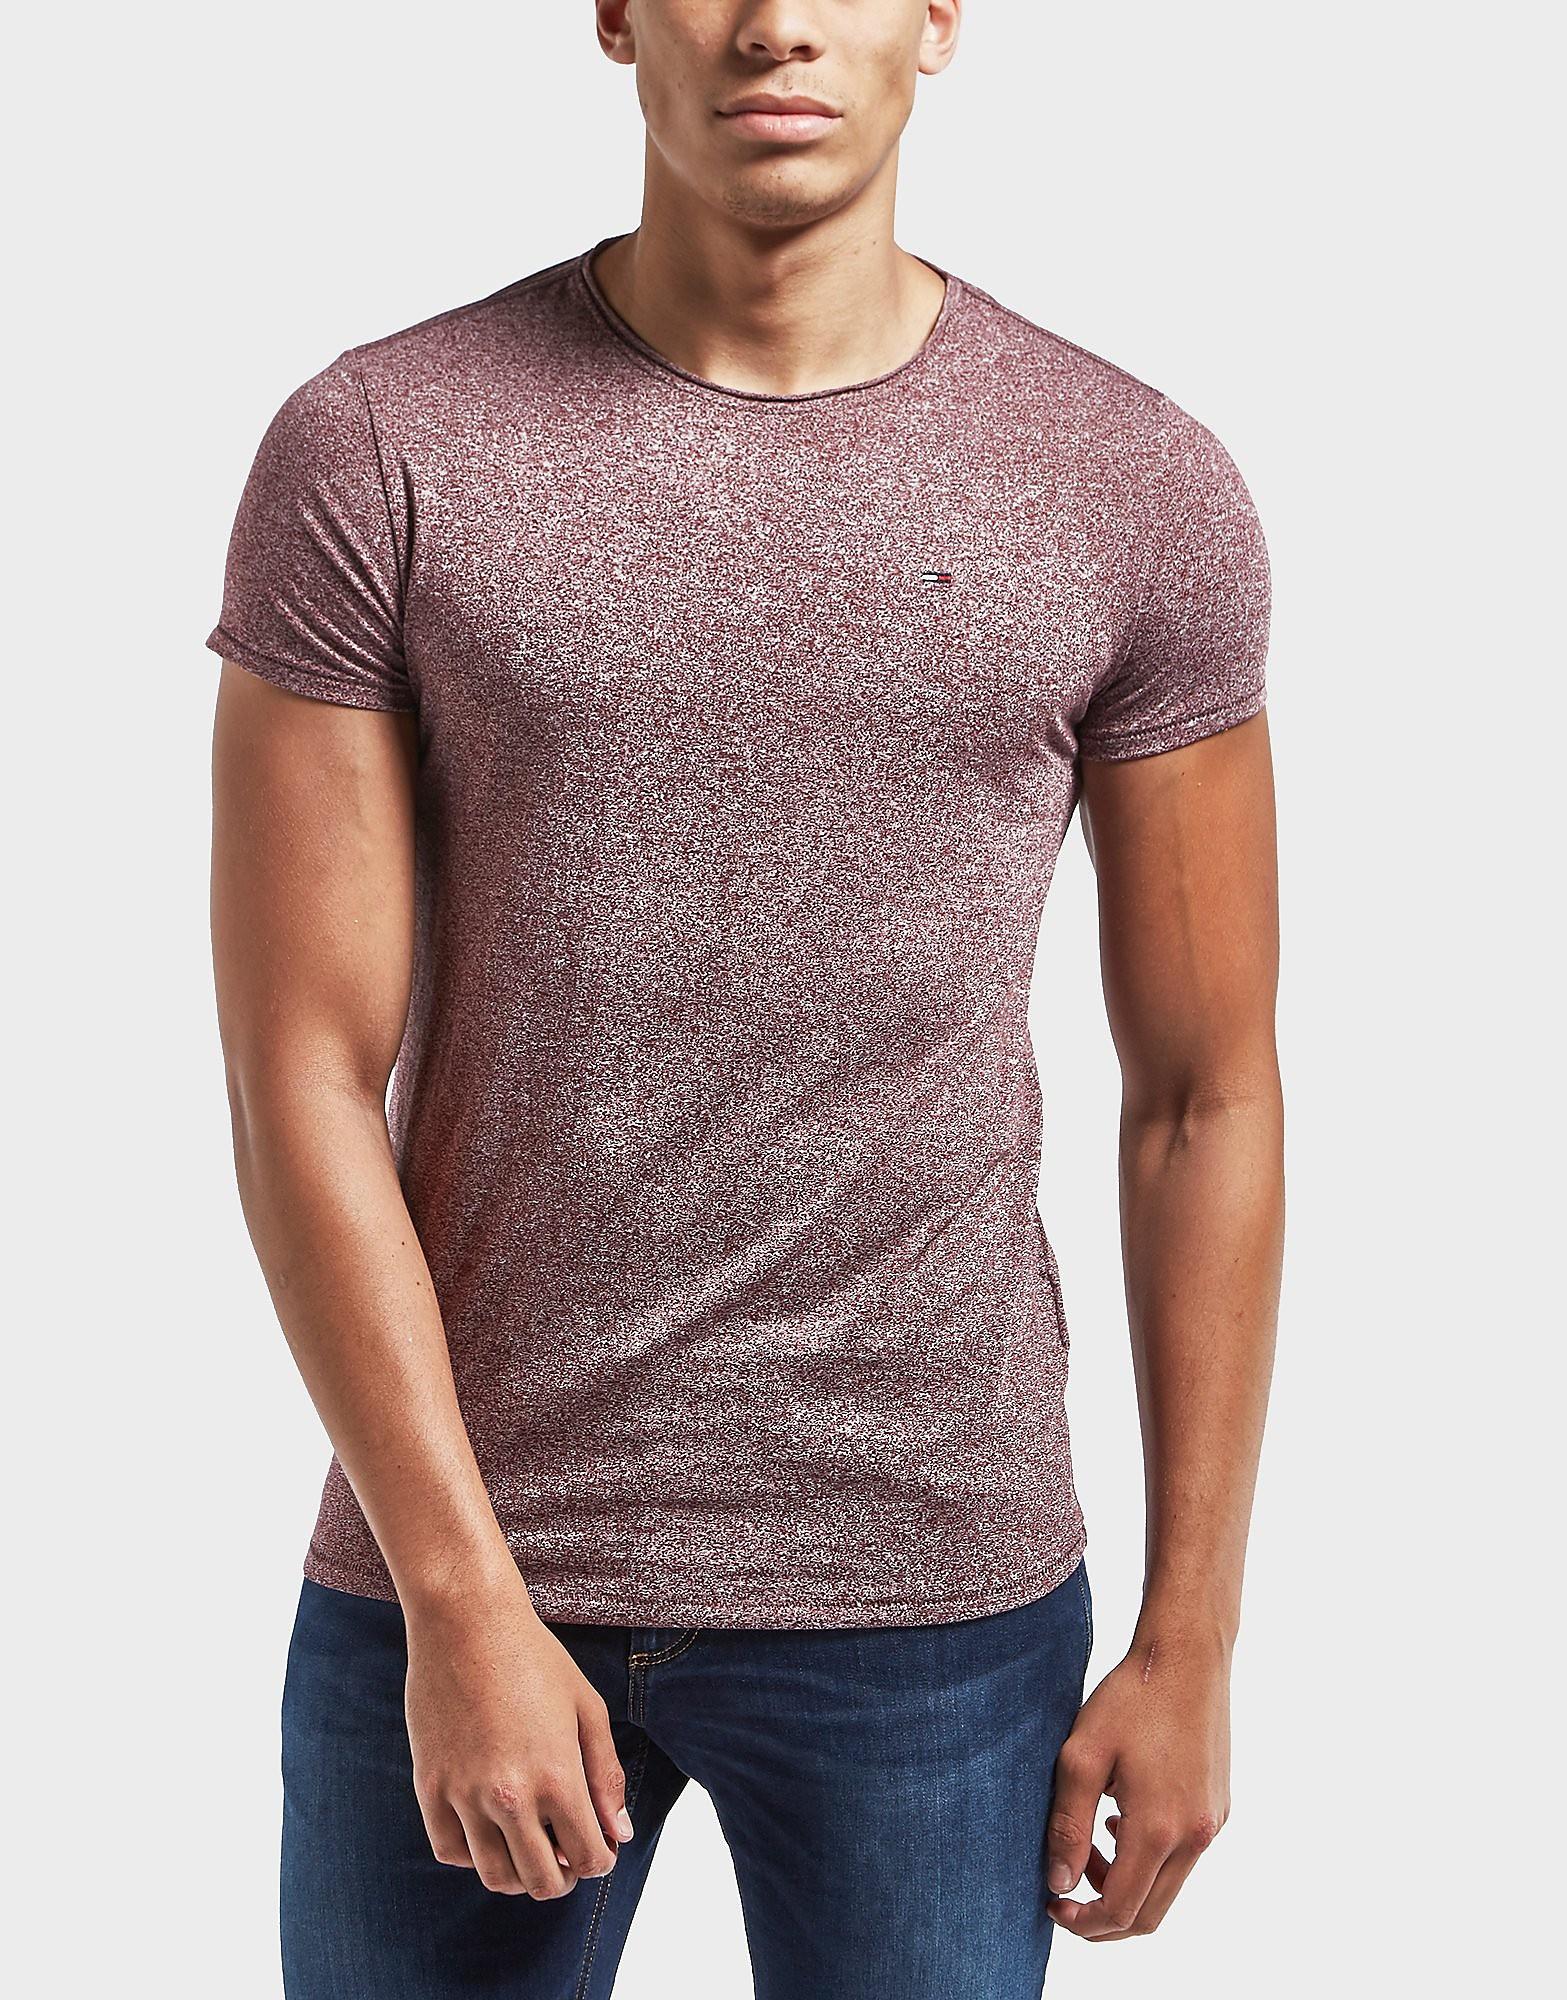 Tommy Hilfiger Jasper Short Sleeve T-Shirt